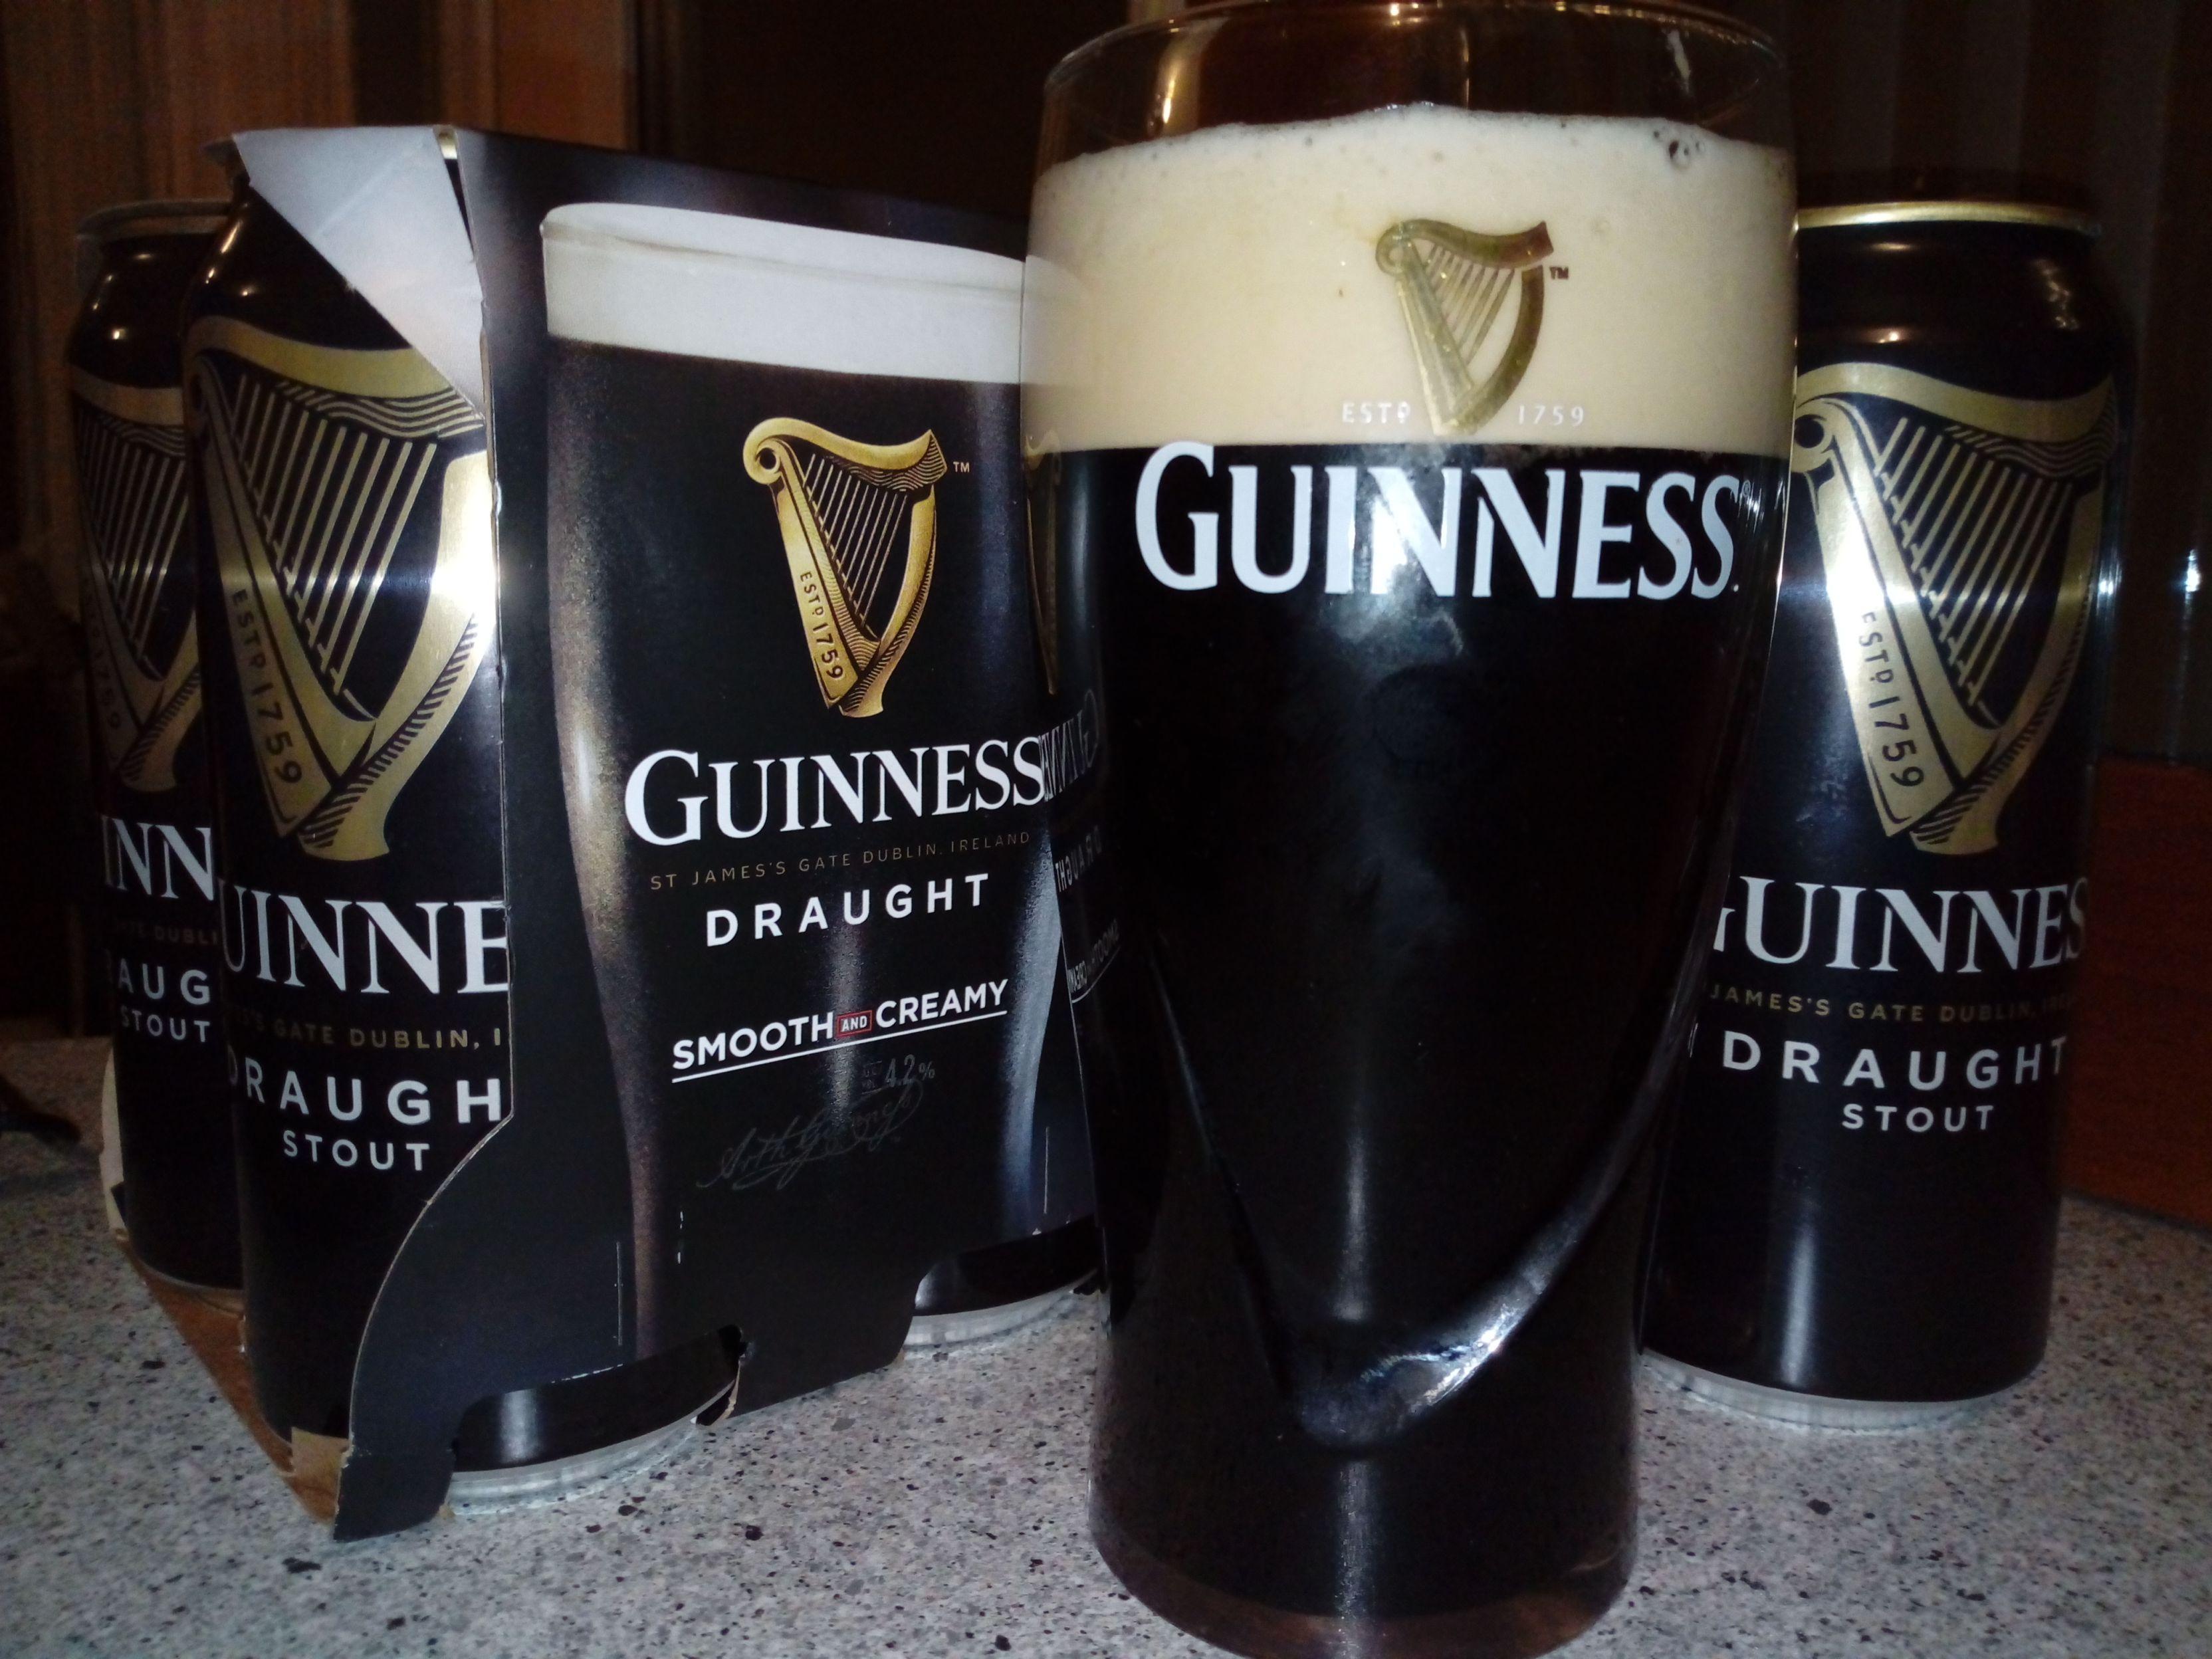 Piwo Guinness Draught 440 ml - Groszek Katowice